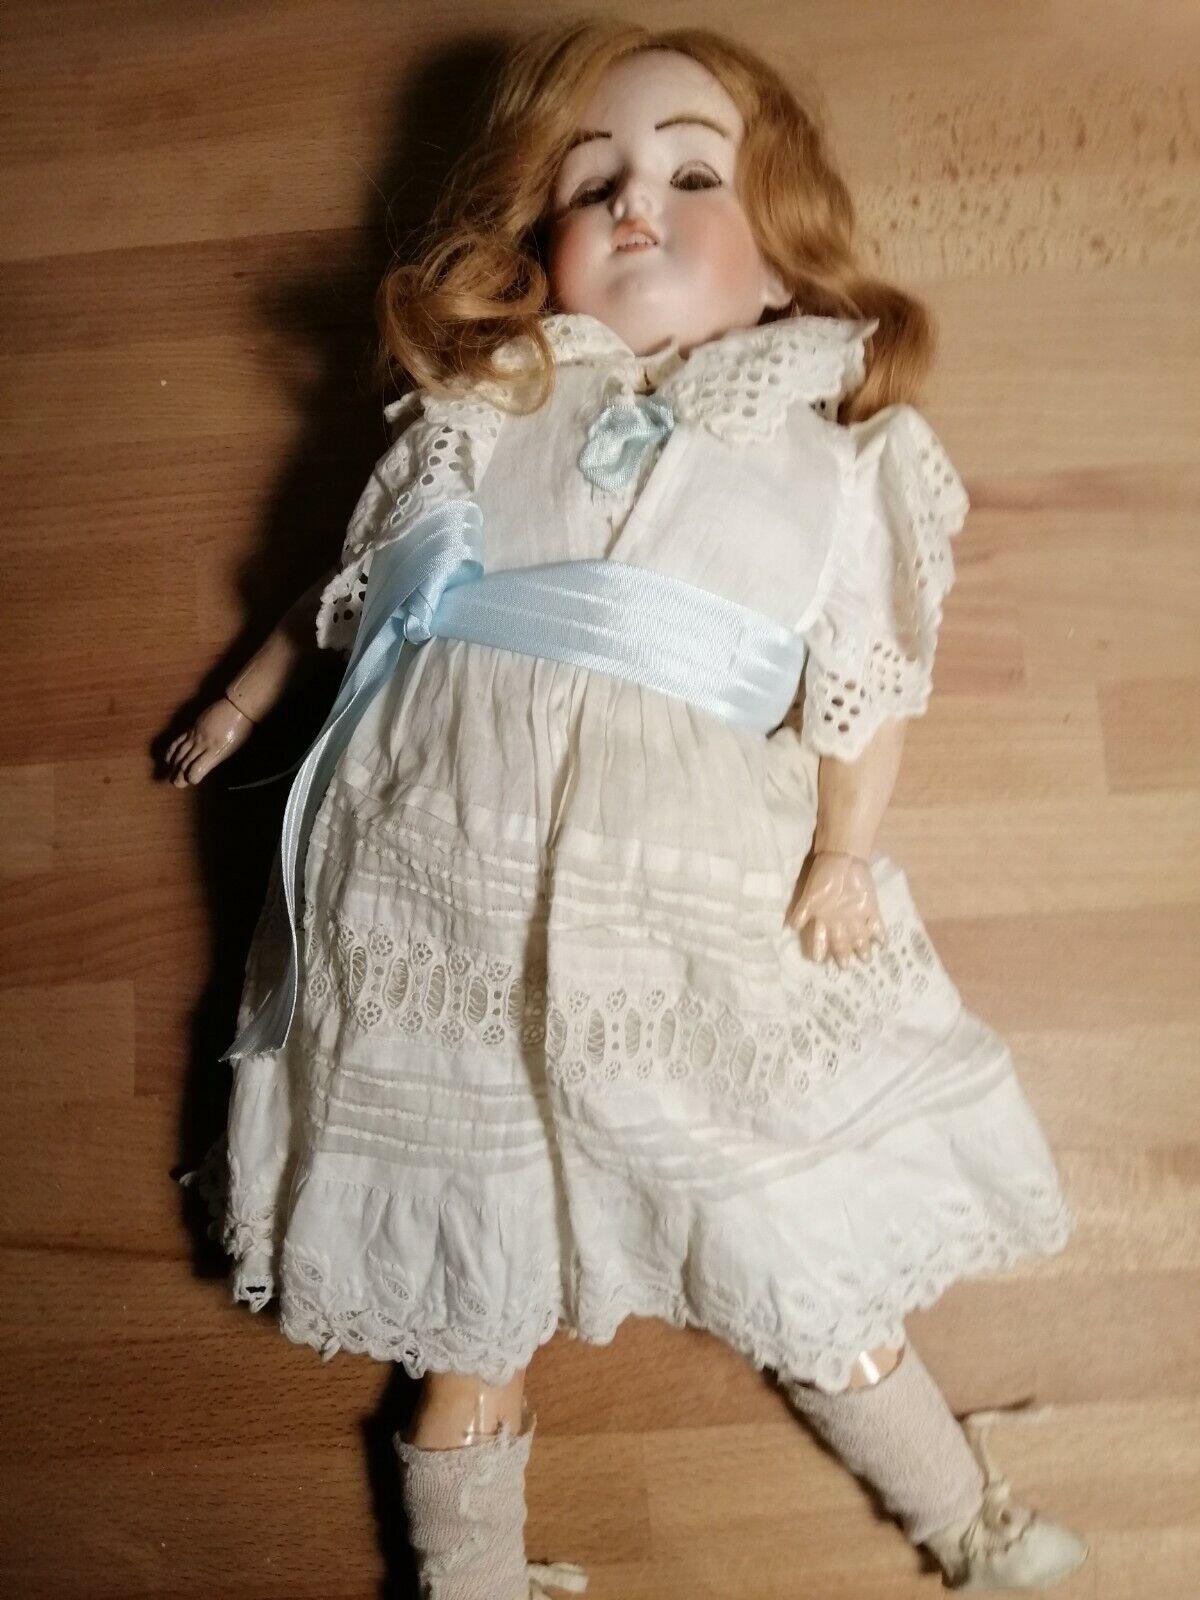 Hermosa Vintage Completa Armand Marseille 18  390 A-4-M - cabeza de Biscuit muñeca de madera